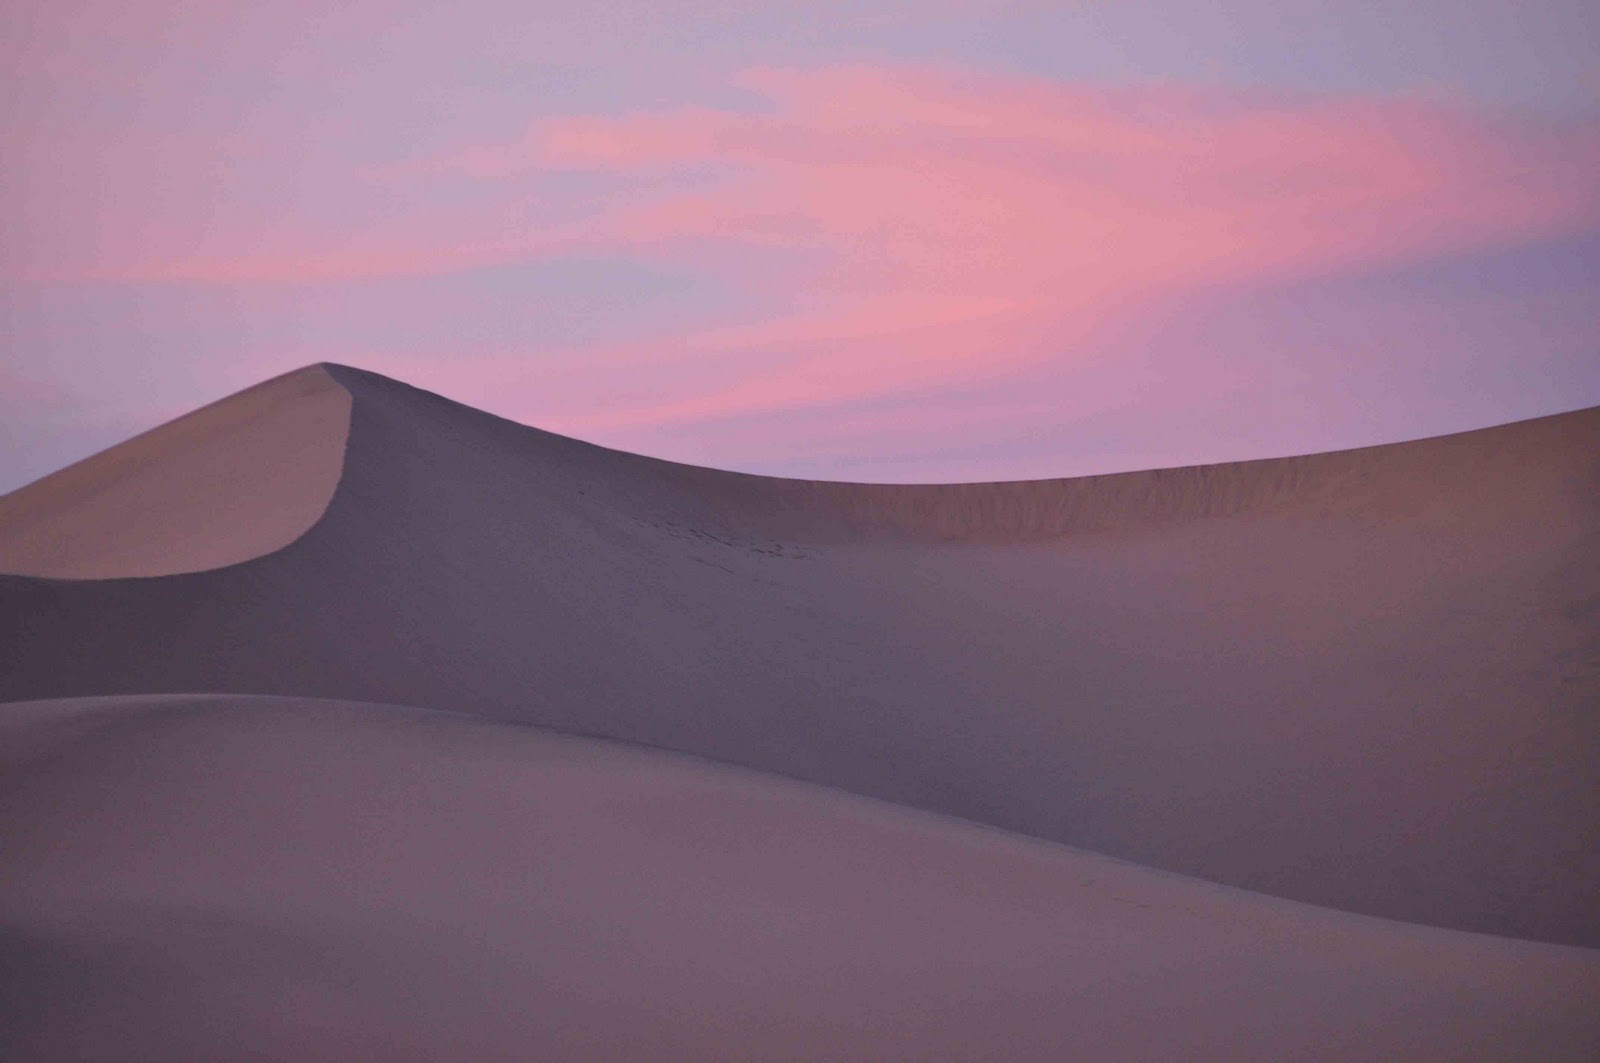 Death Valley Sunset Dunes Wallpaper 1 Ewallpapers Hub